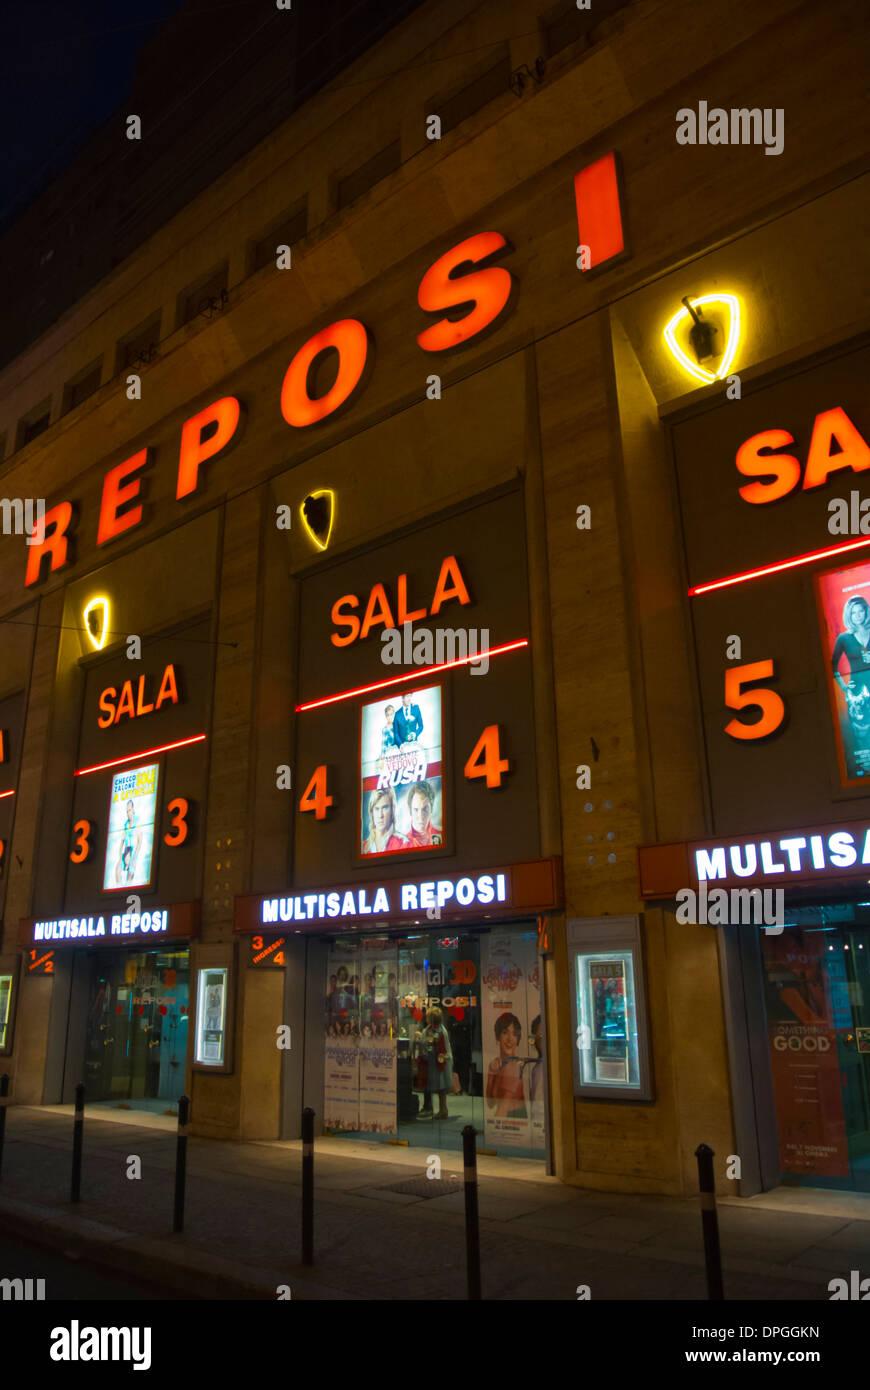 Reposi multiplex-Kino Film Theater Zentrum Turin Piemont Italien Europa Stockbild